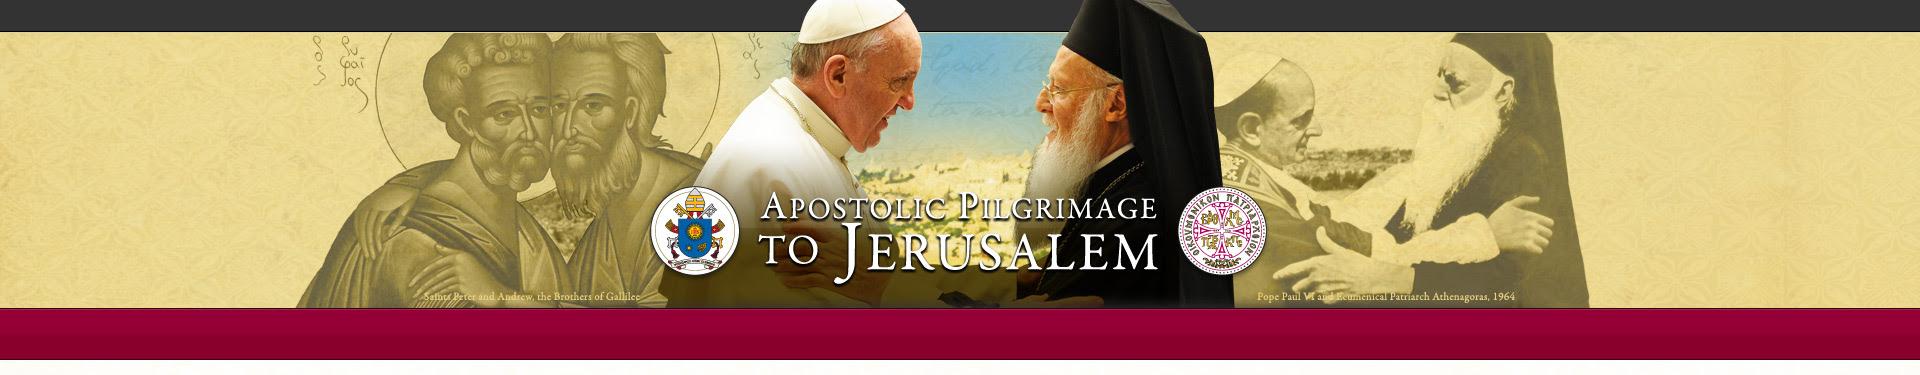 http://www.apostolicpilgrimage.org/apostolic-pilgrimage-theme/images/apostolic_pilgrimage_header_desktop.jpg